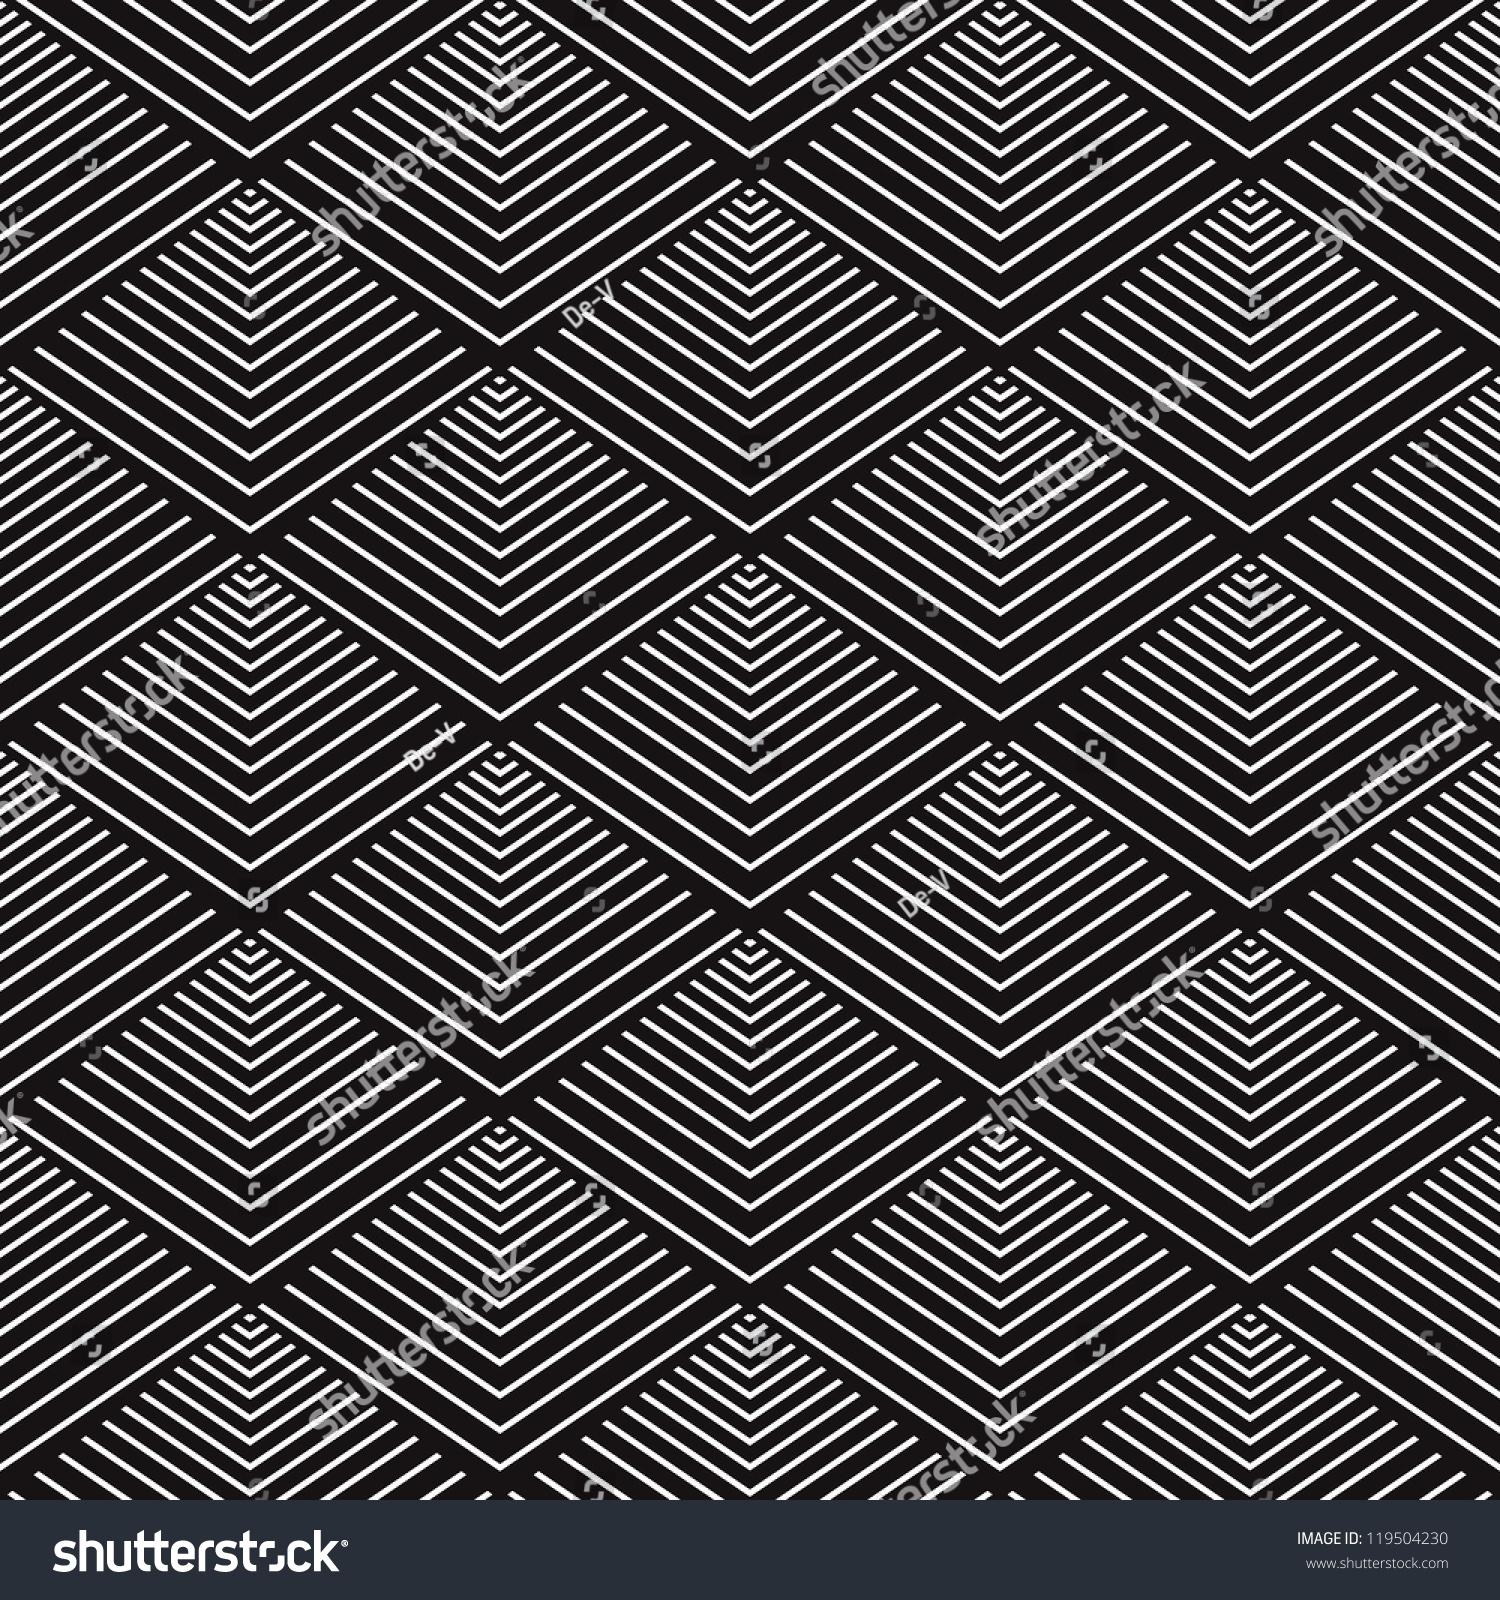 Ethnic modern geometric seamless pattern ornament stock for Object pool design pattern